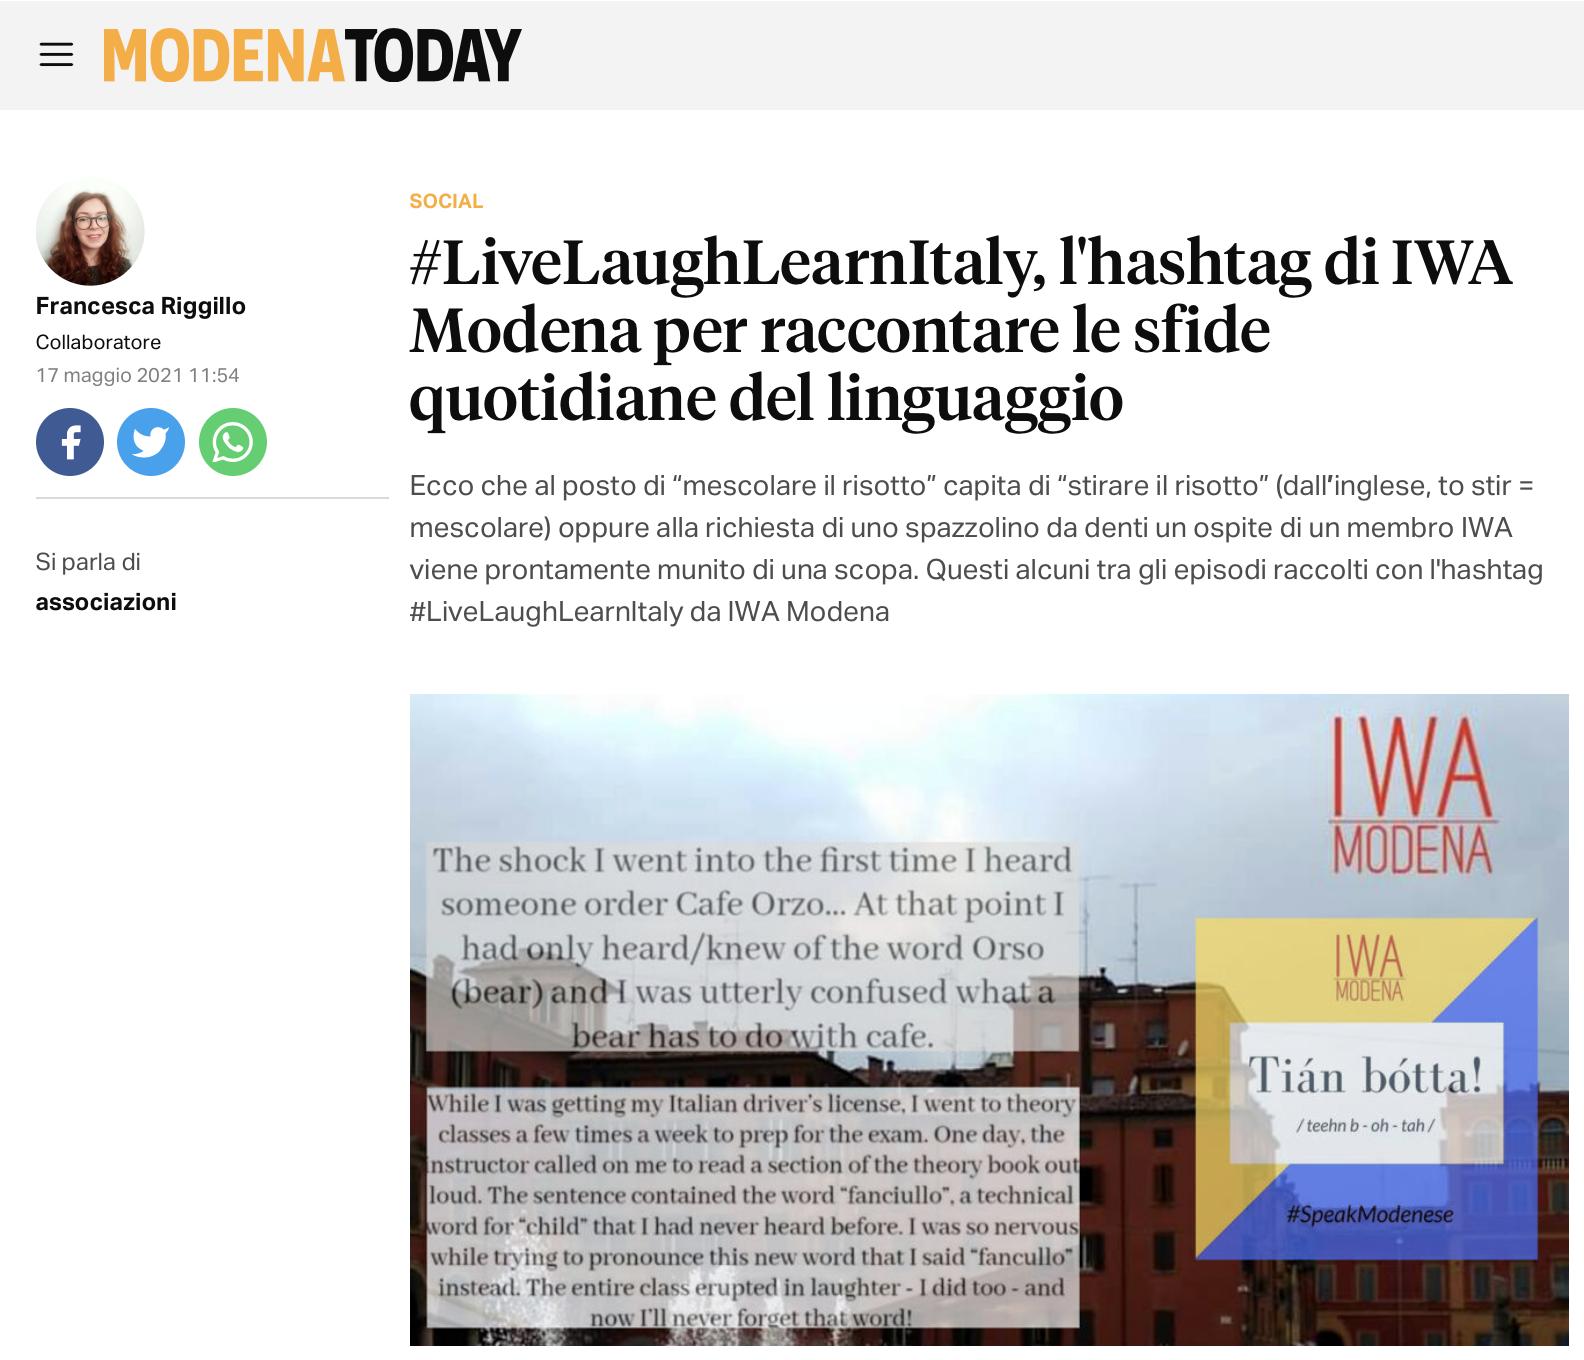 live laugh learn iwa modena modena today